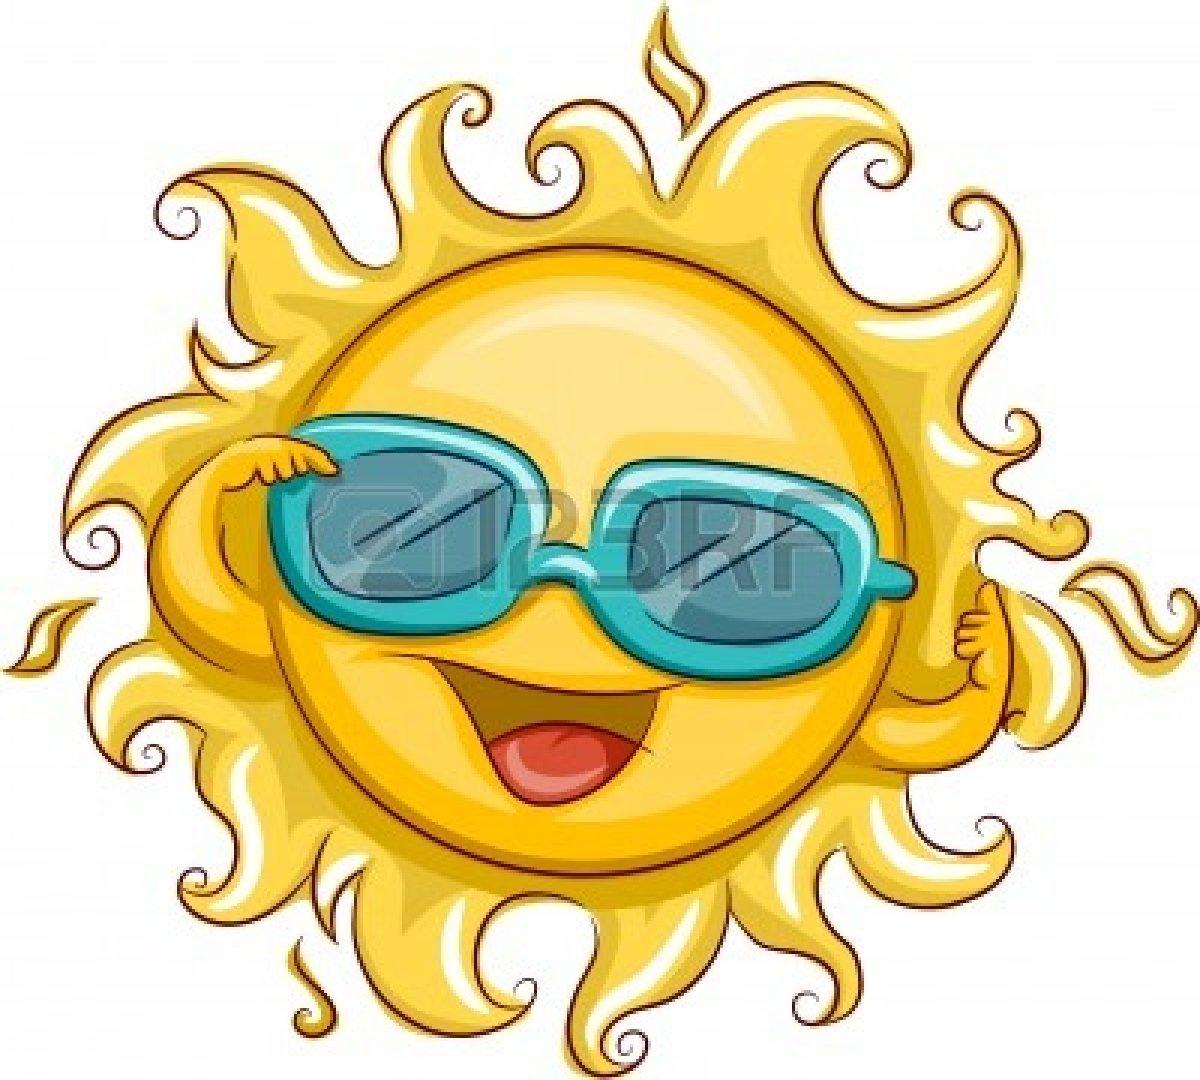 1200x1080 Fun In The Happy Sun Clip Art Images Cute Funny